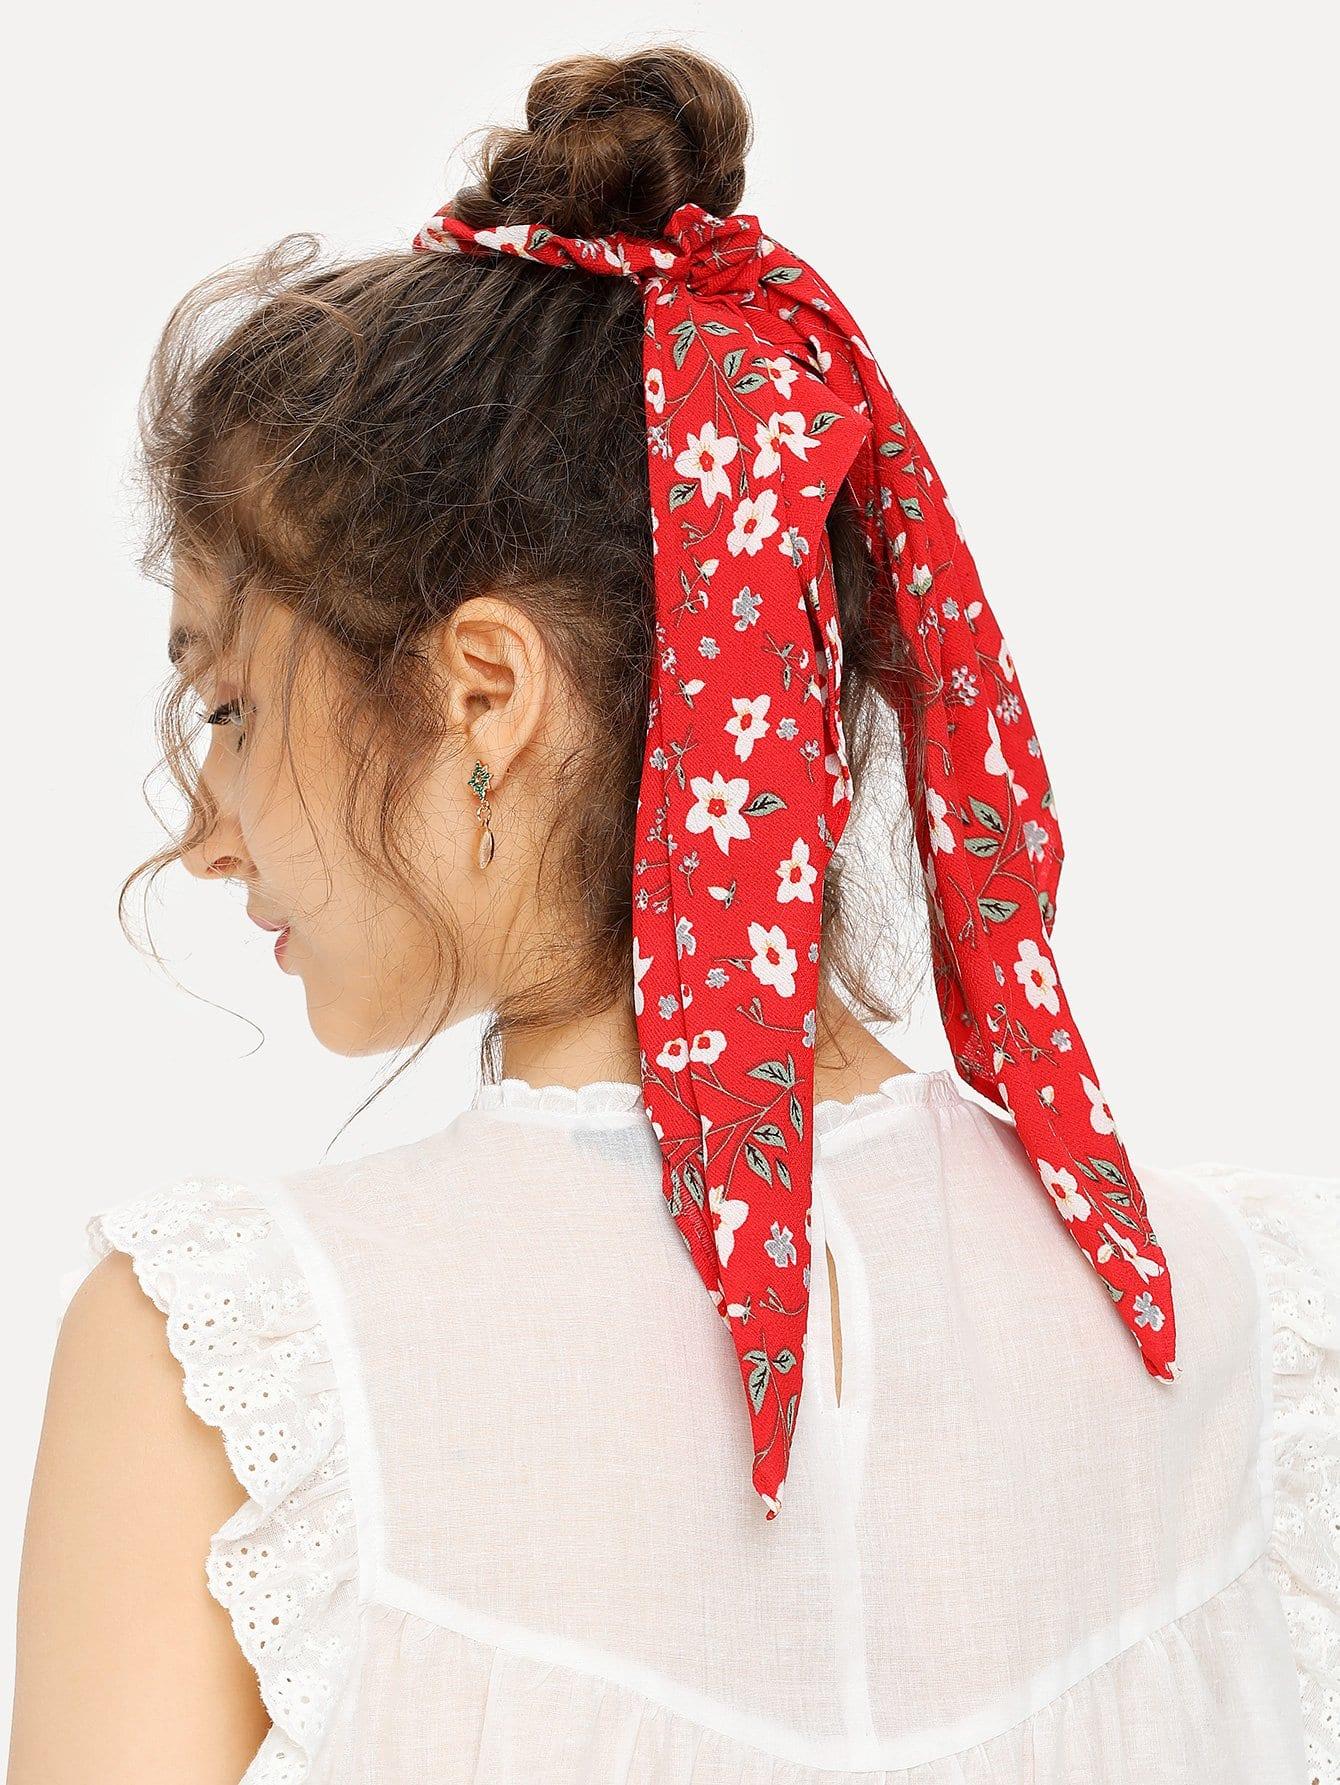 Calico Print Hair Tie hair tie 3pcs